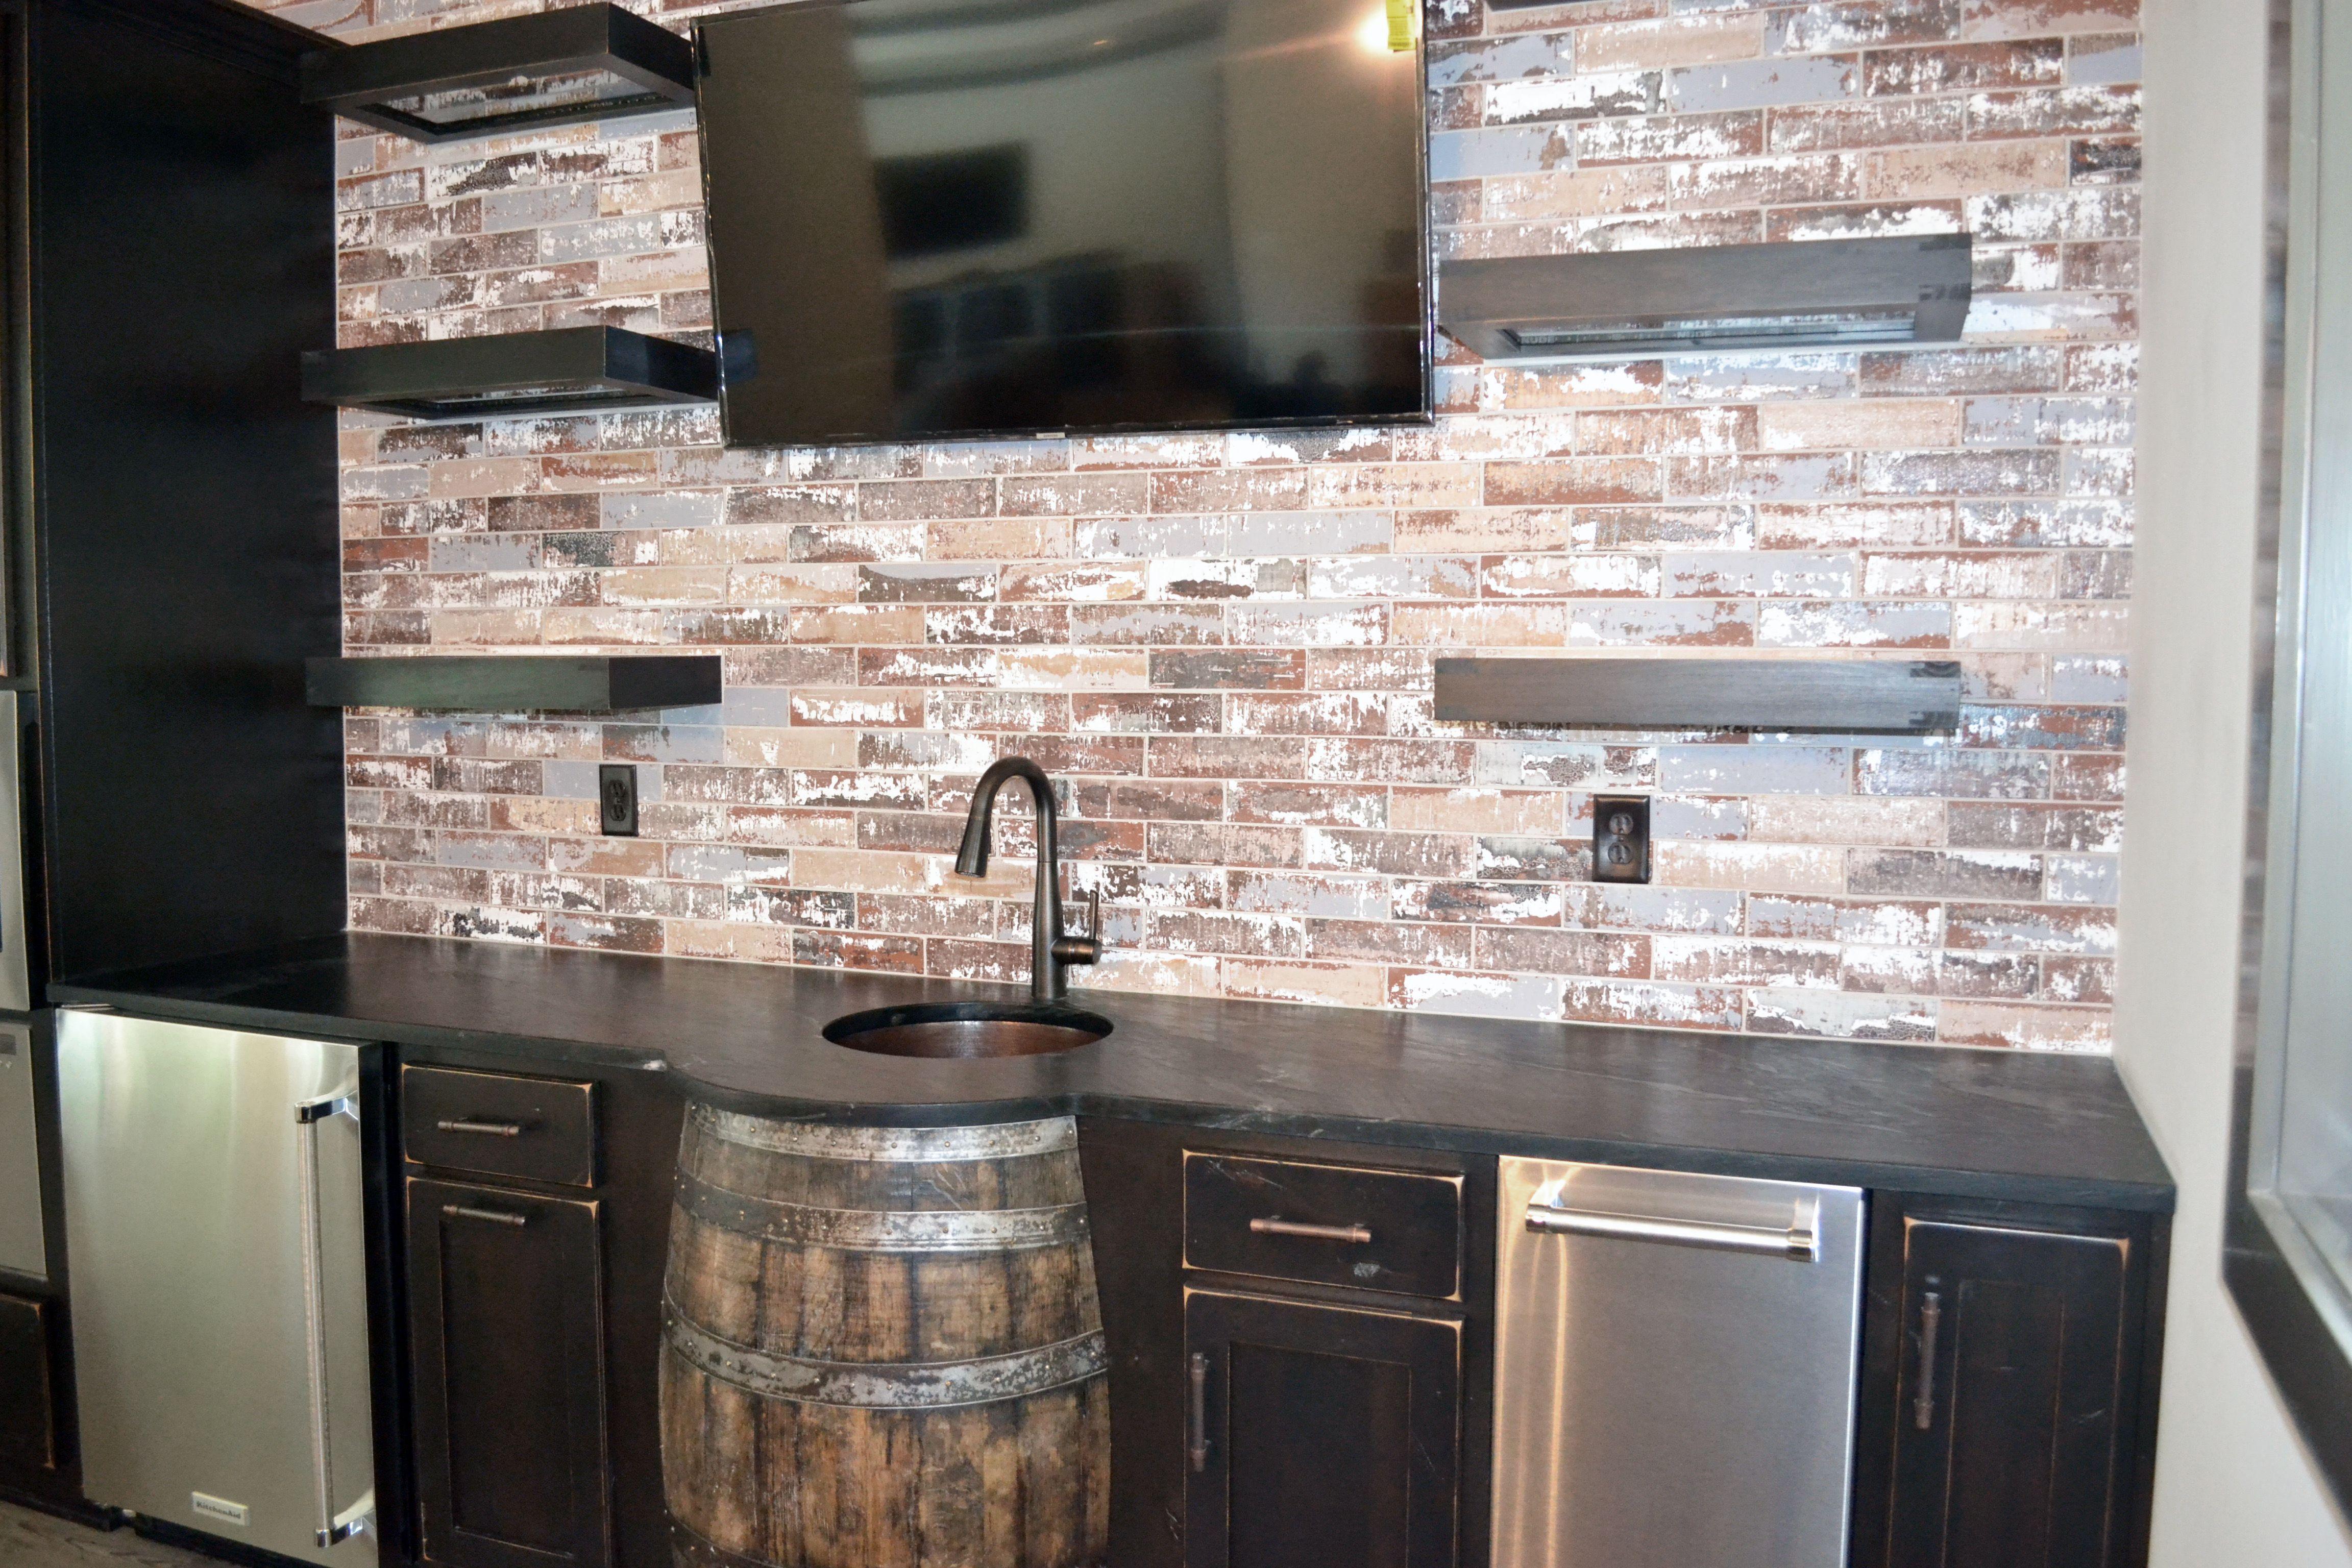 Kitchen Backsplash Tile Parade Of Homes Bowling Green Kentucky